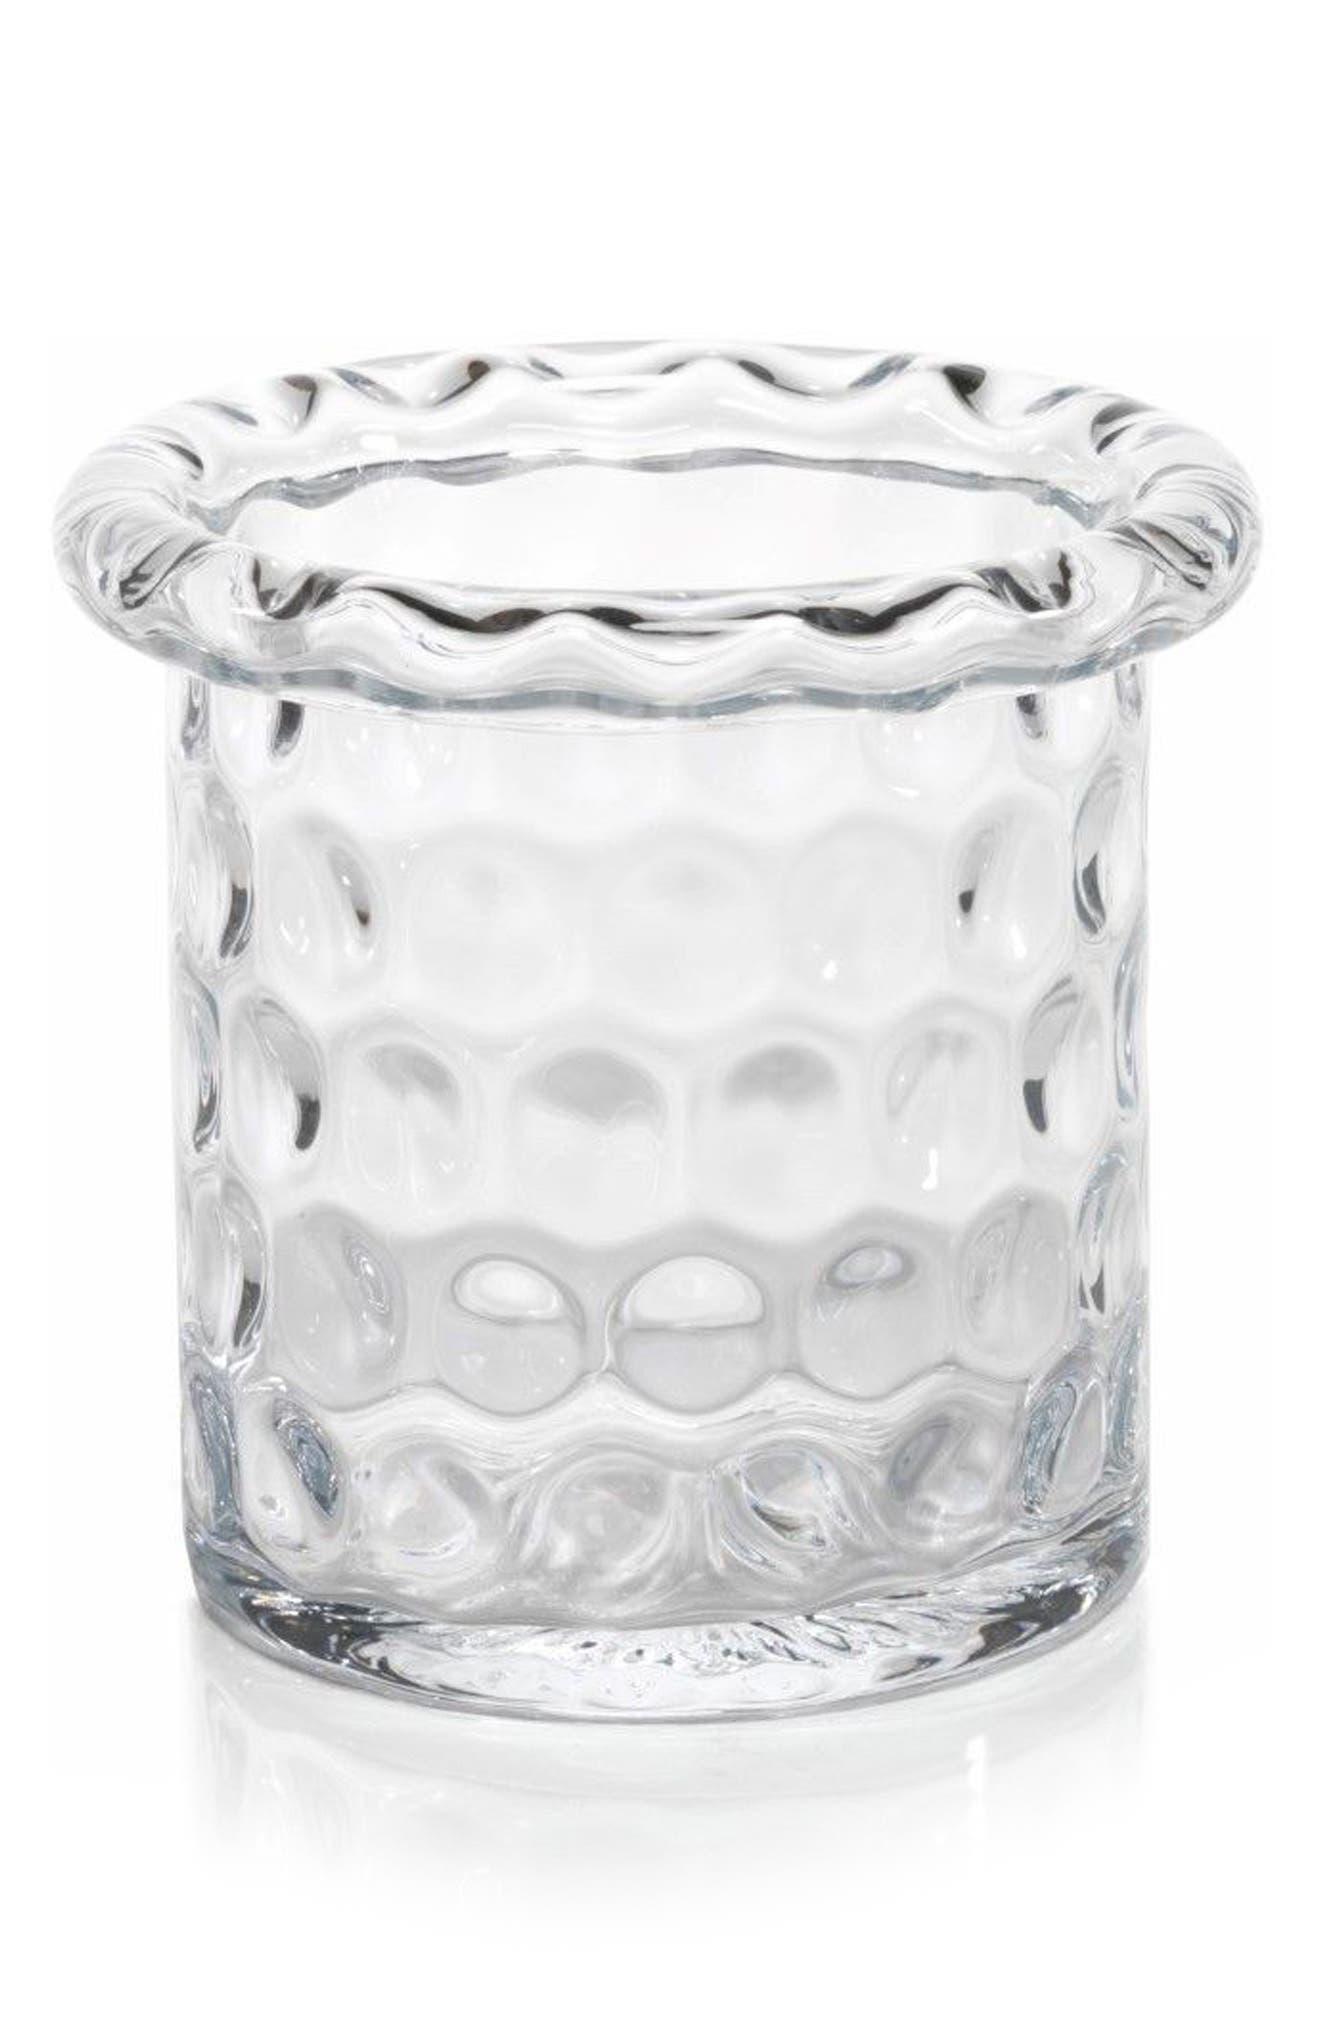 Main Image - Zodax Ravello Glass Ice Bucket